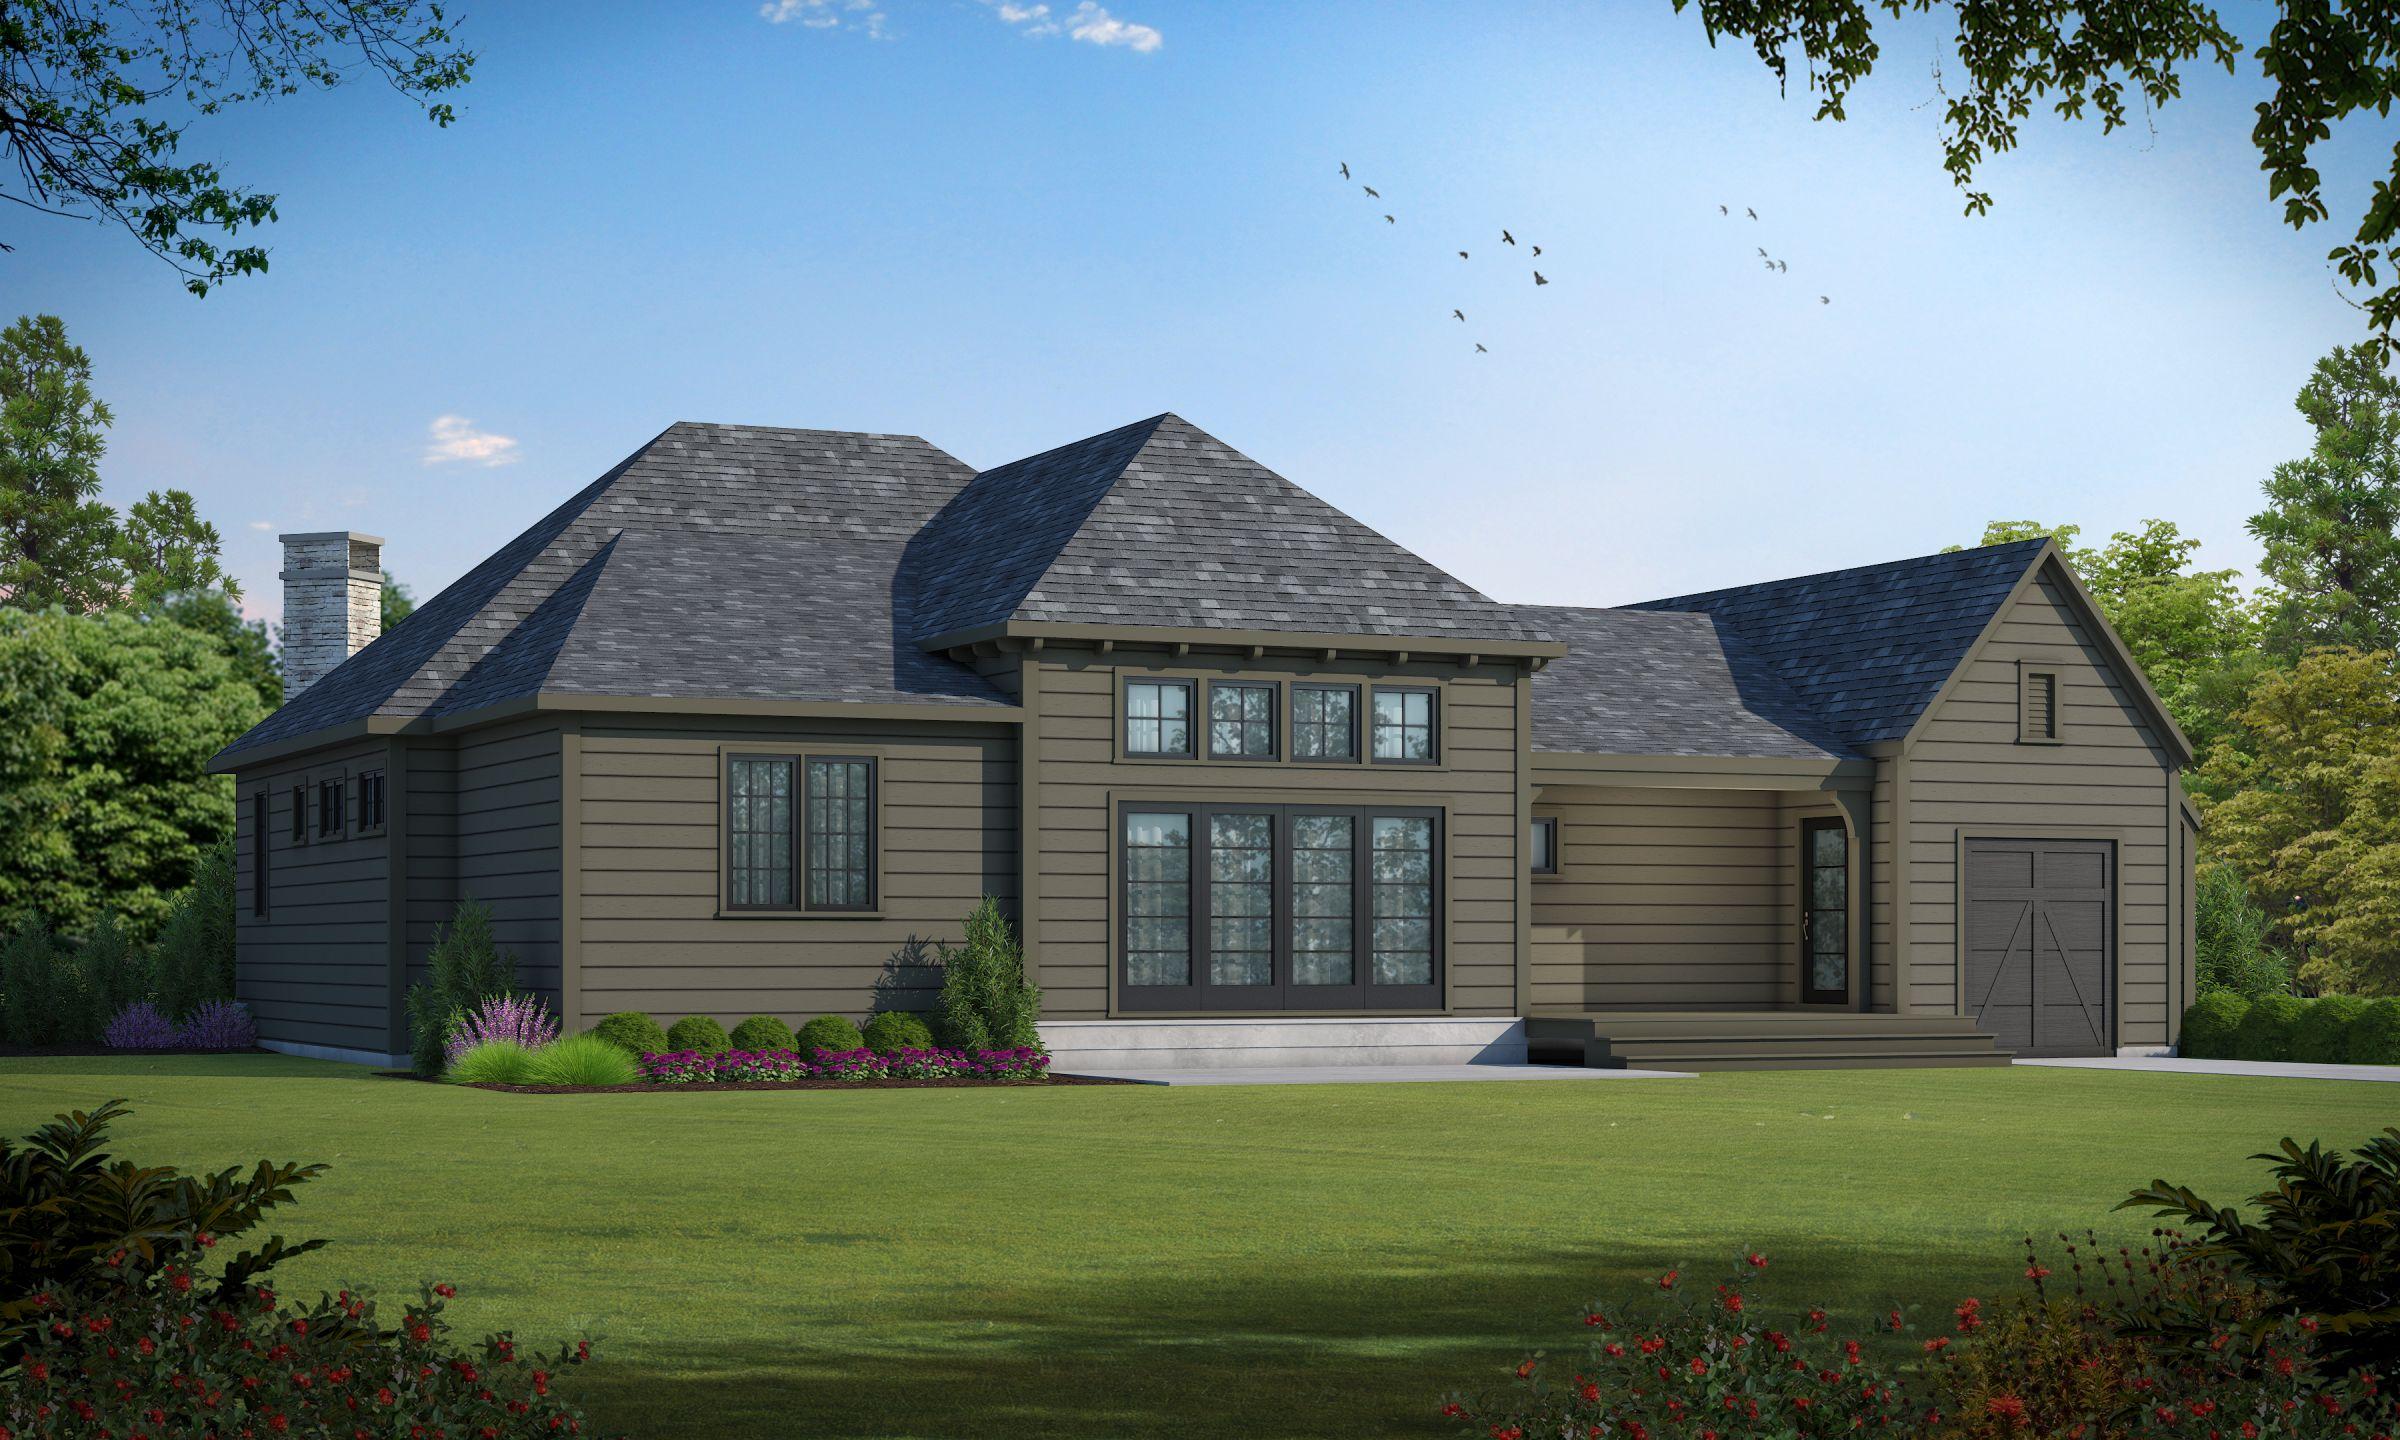 residential-warren-county-iowa-0-acres-listing-number-15598-3-2021-06-18-132747.jpg